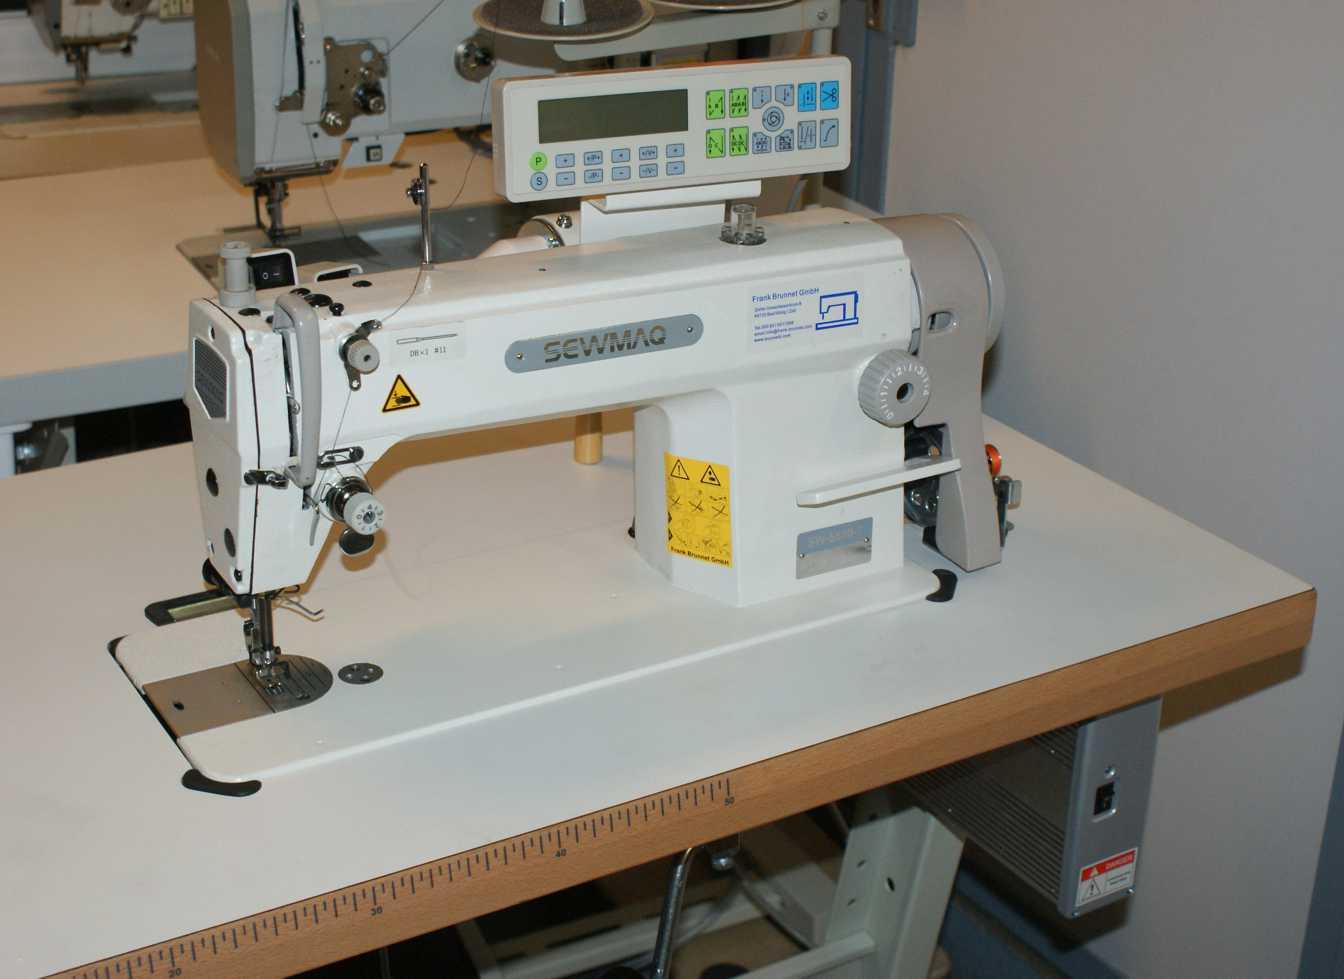 Industrienähmaschine Sewmac 5550-7  Fadenabschneider  Verrieglungsautomatik